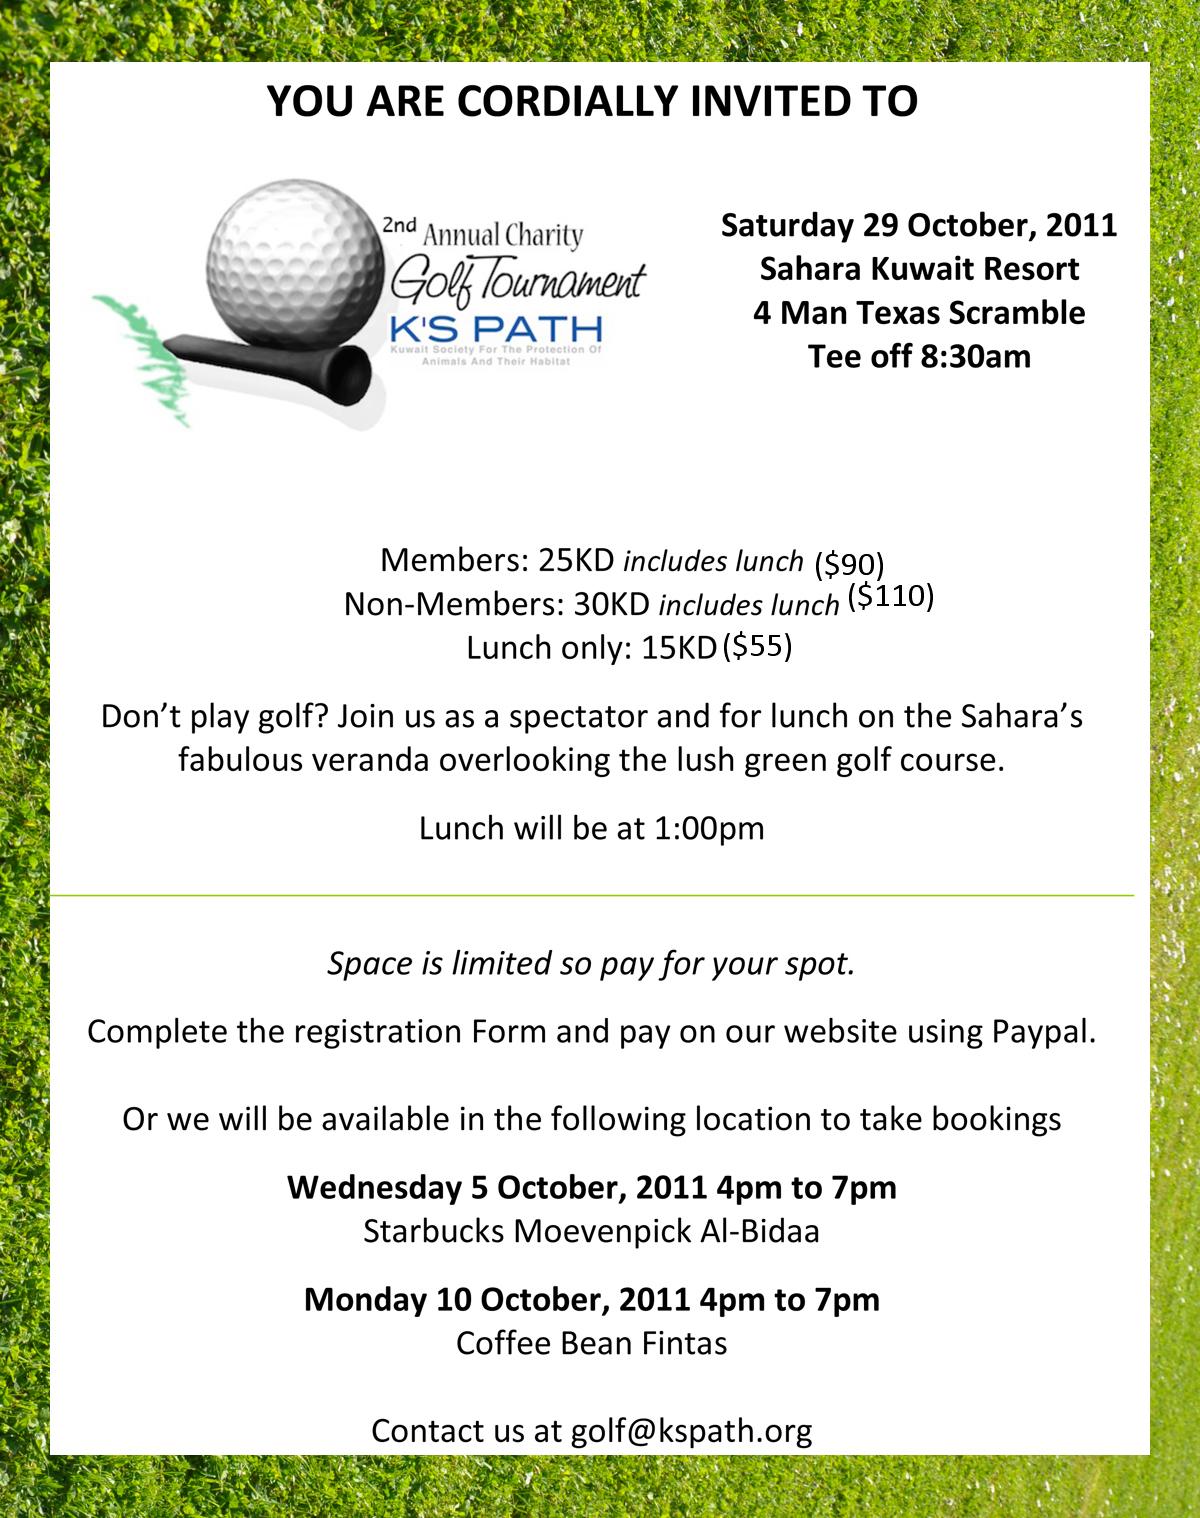 golf tournament invitation templates signazon party invitations ideas. Black Bedroom Furniture Sets. Home Design Ideas